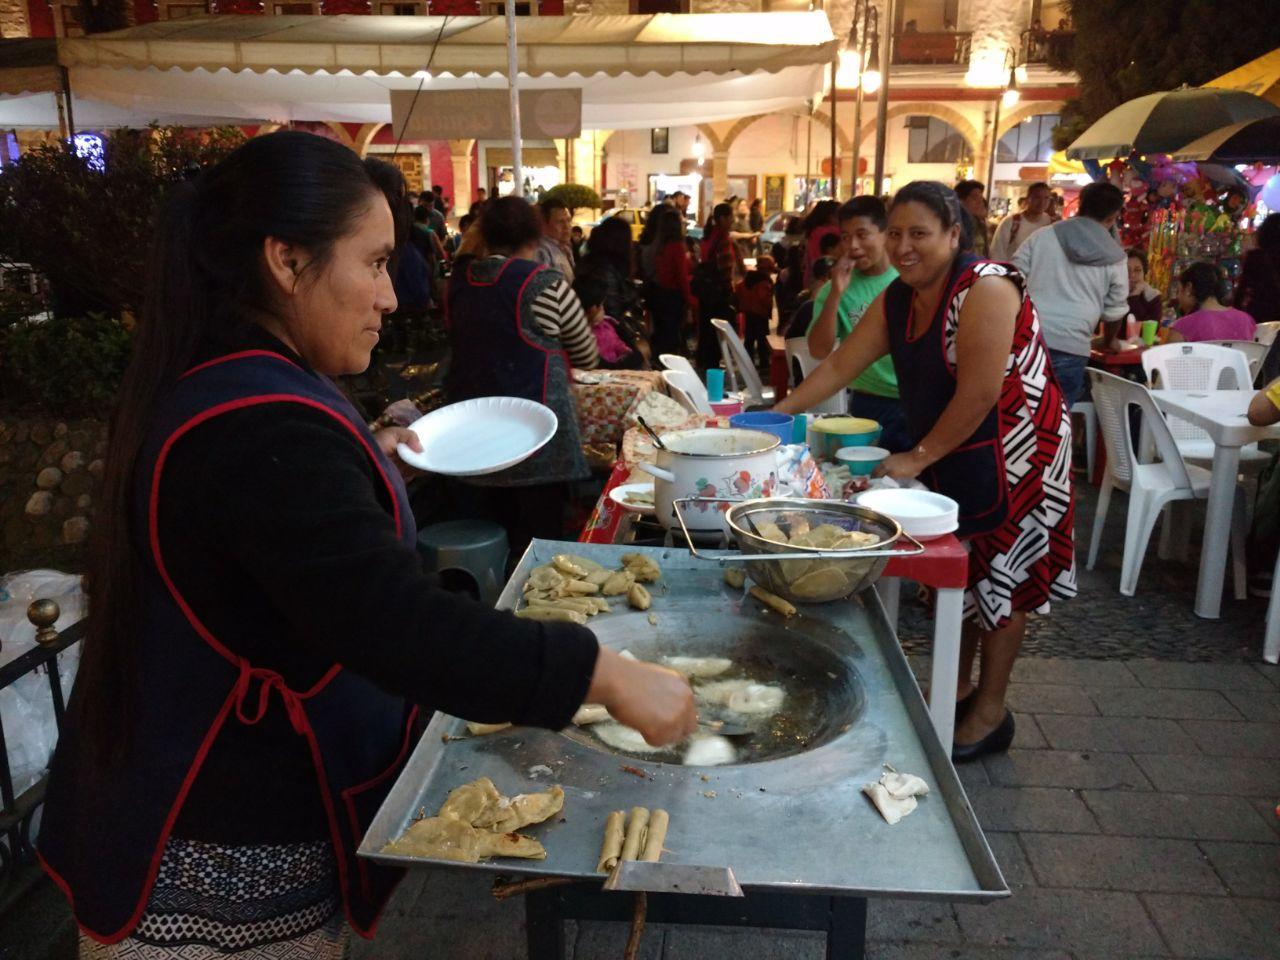 Un gozo antiguo, el Festival de la Enchilada en Huauchinango